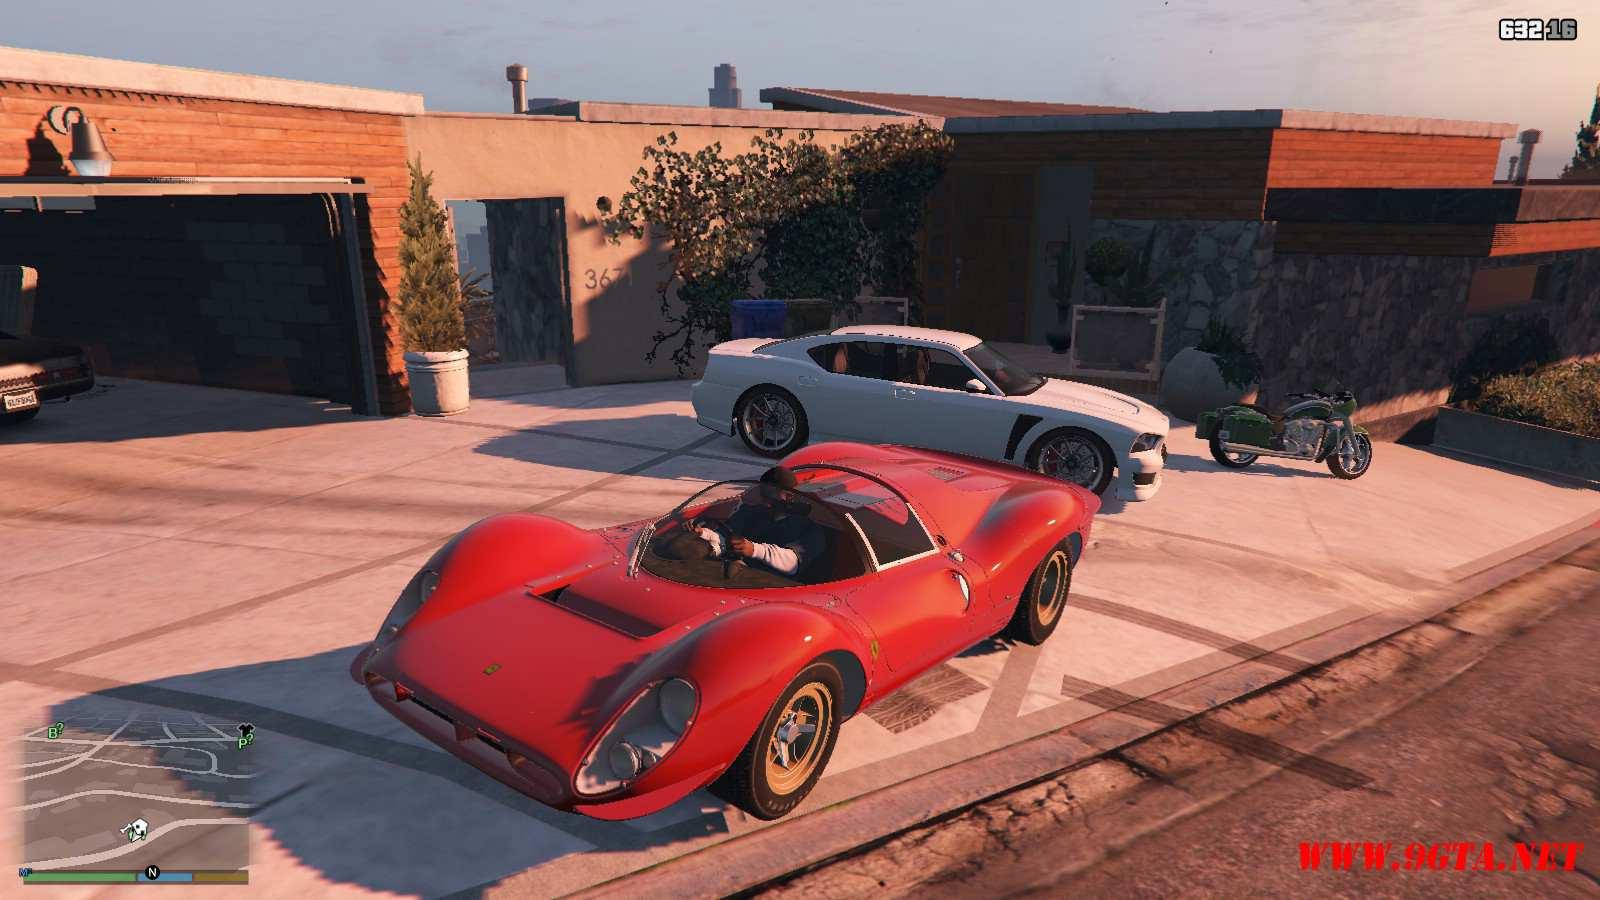 1967 Ferrari 330 P4 GTA5 Mods (1)